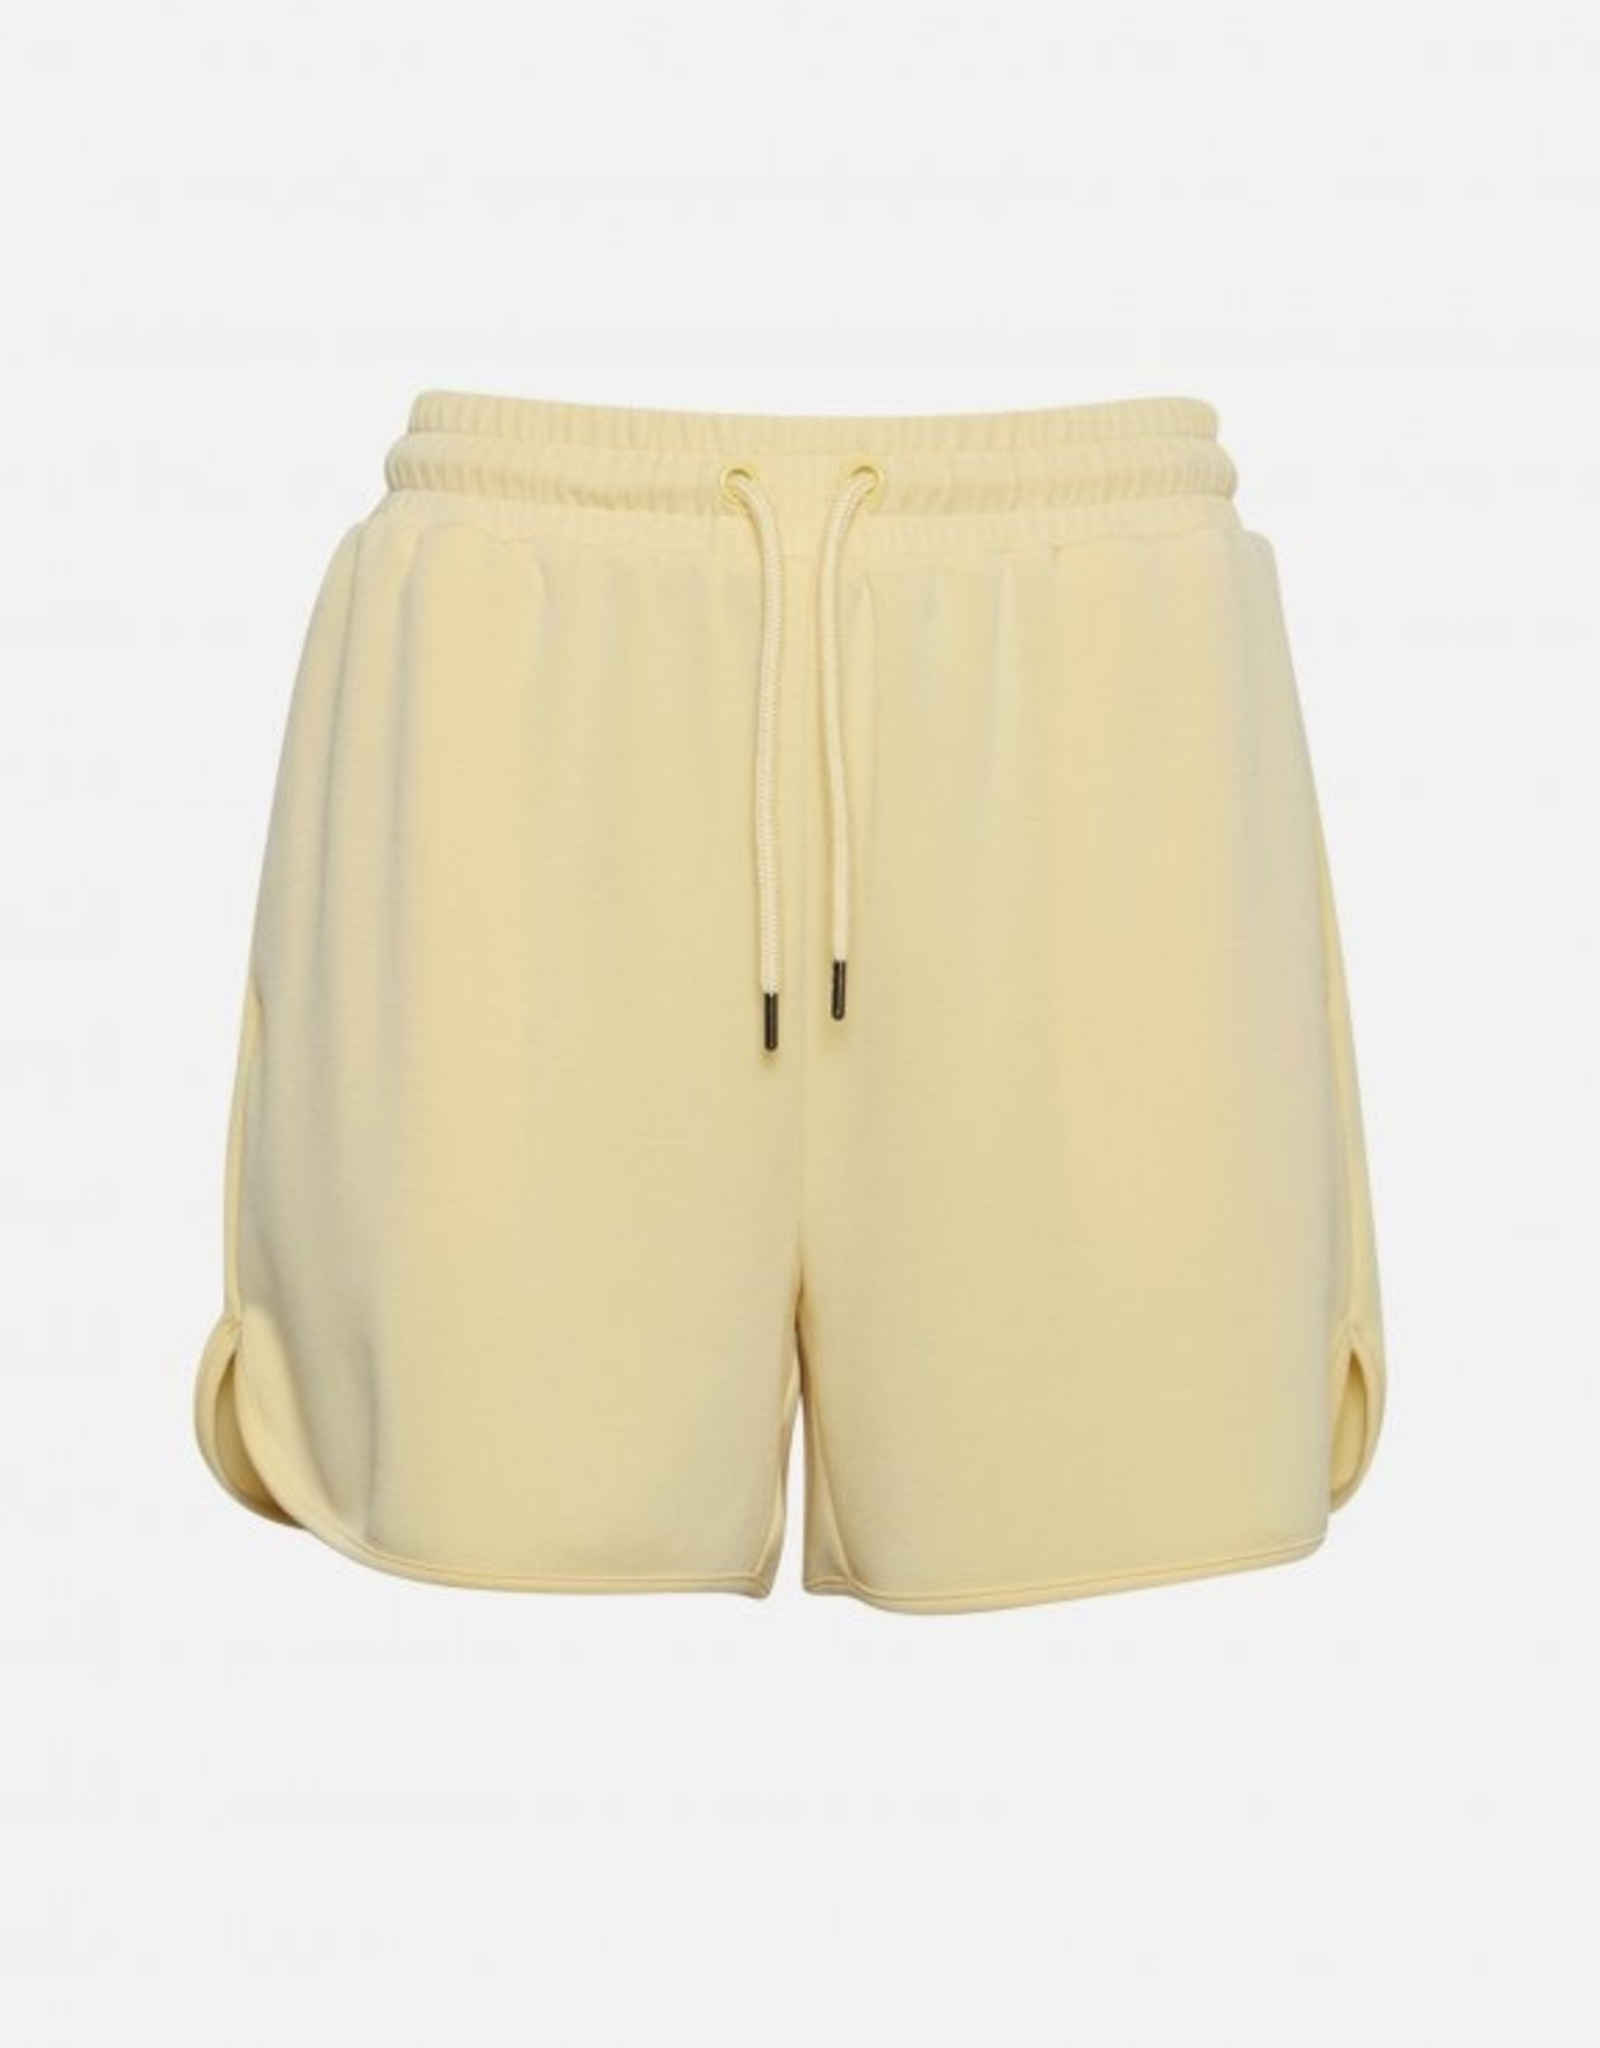 Moss Copenhagen Terisa Merla Shorts Pale Banana